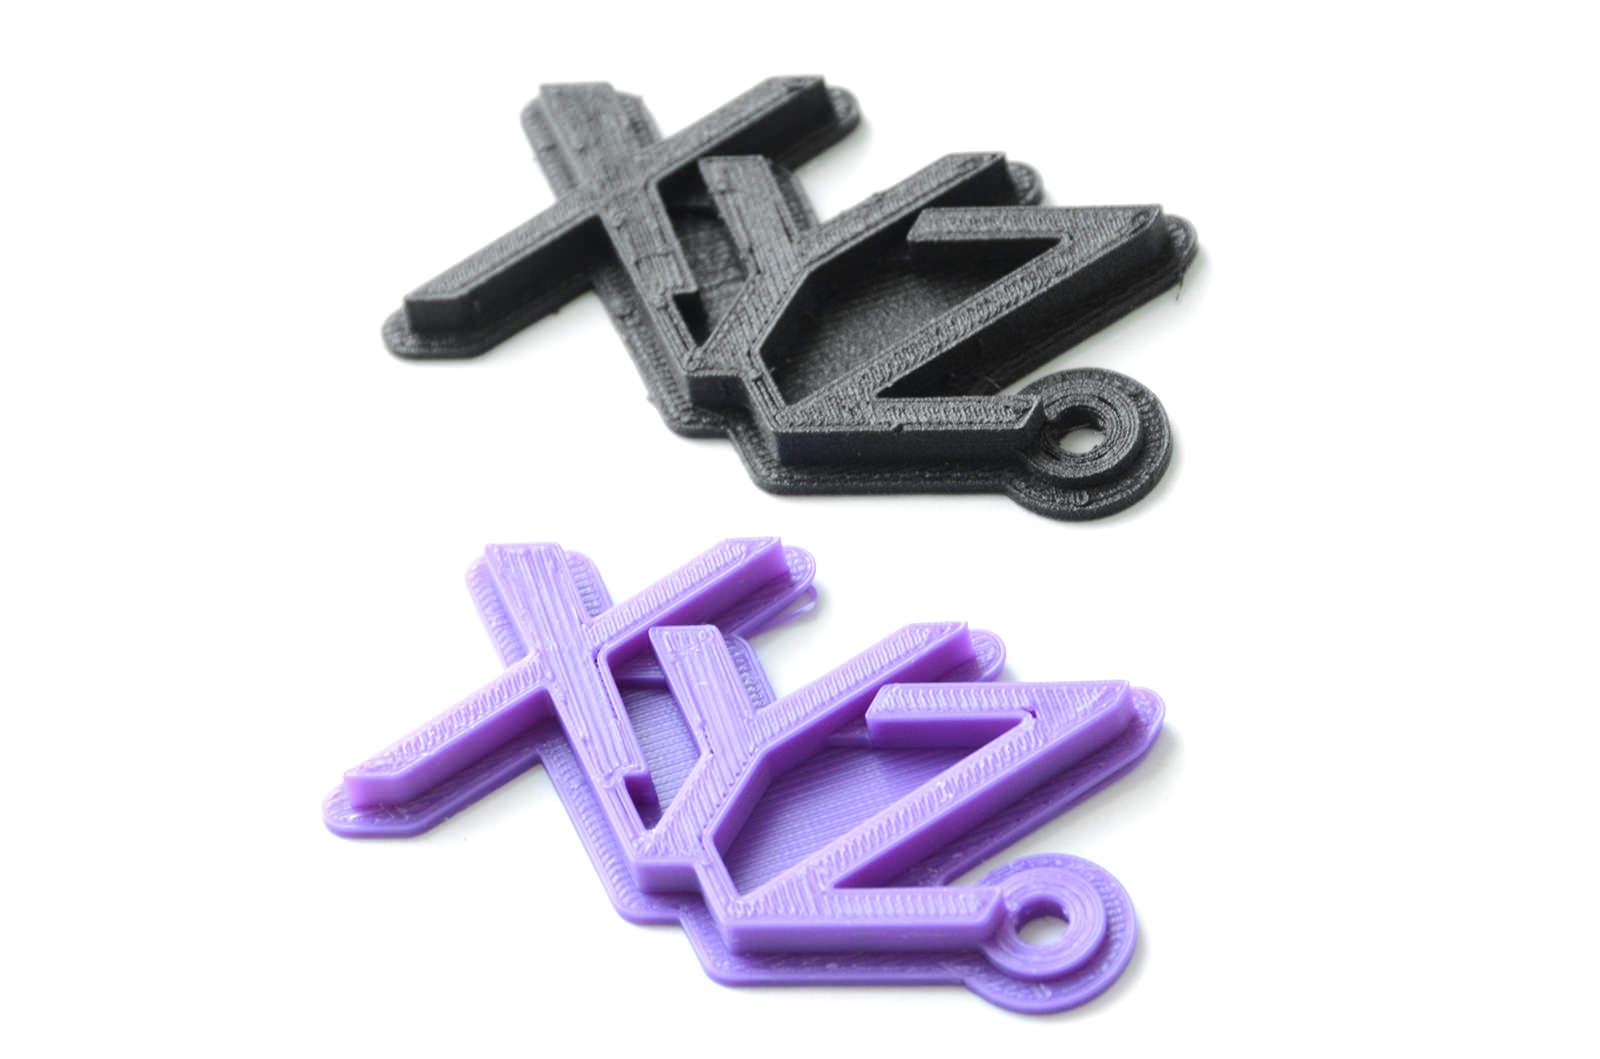 xyzprinting-da-vinci-pro-1-17